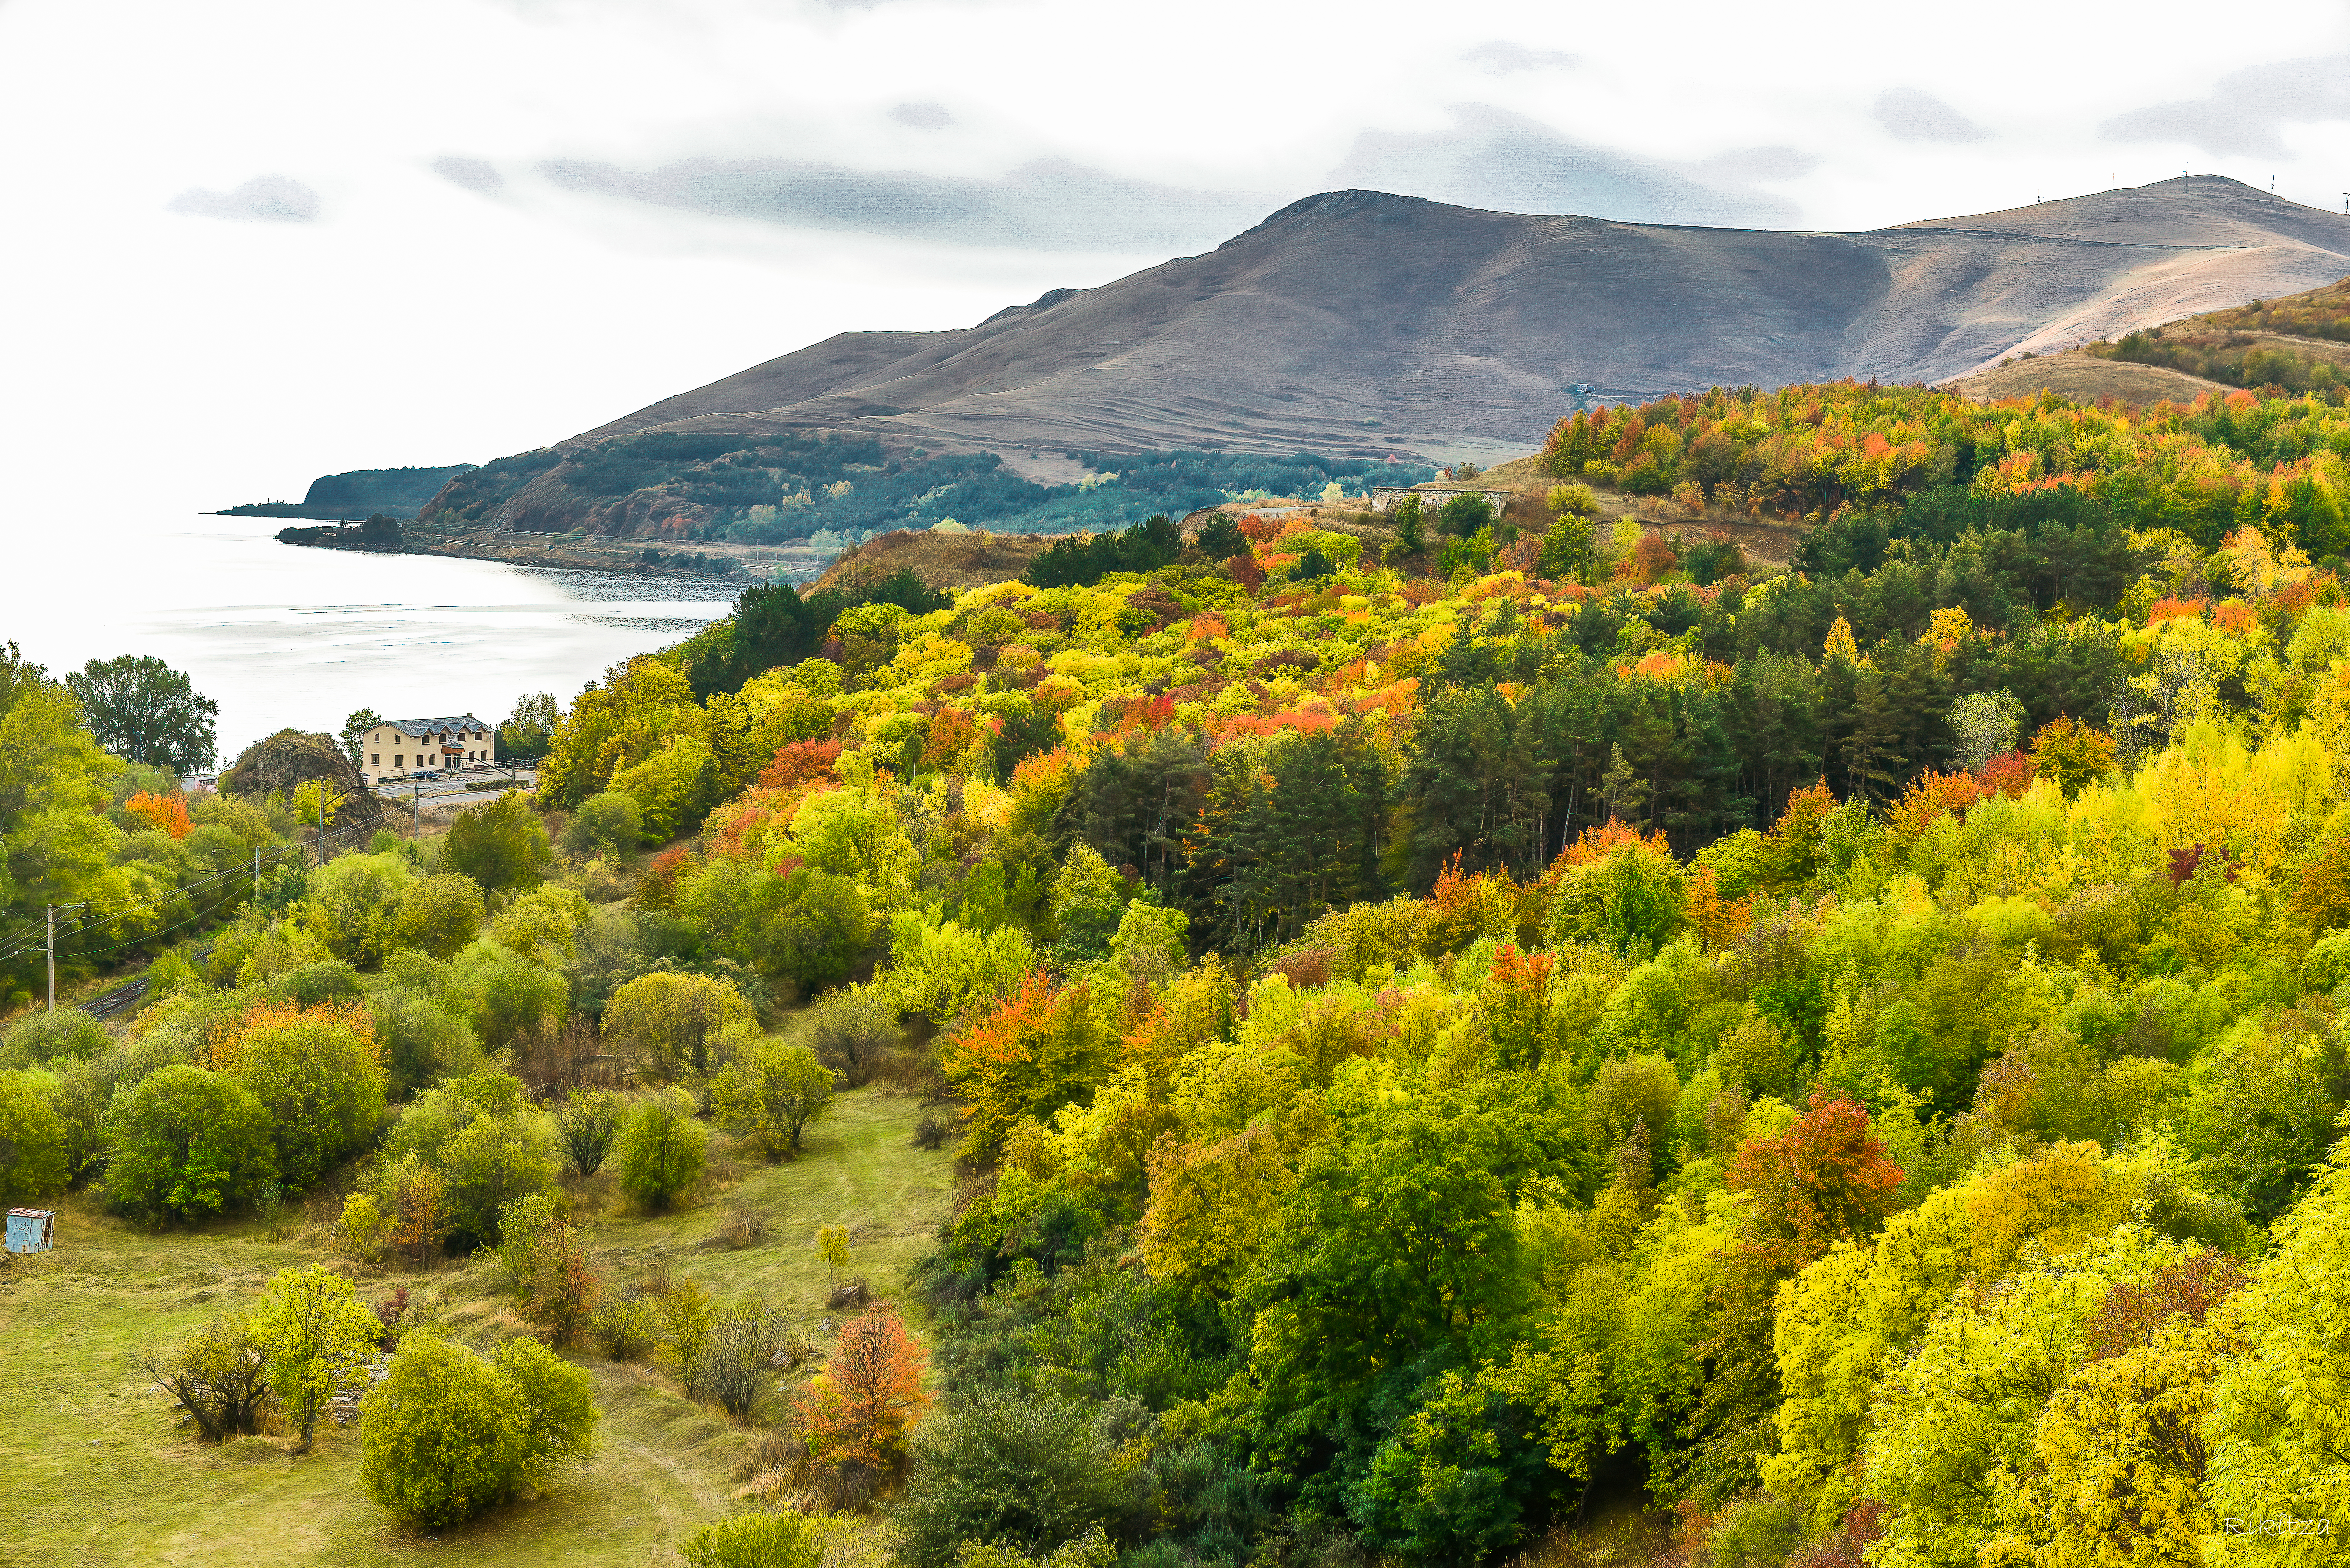 Autumn in Armenia